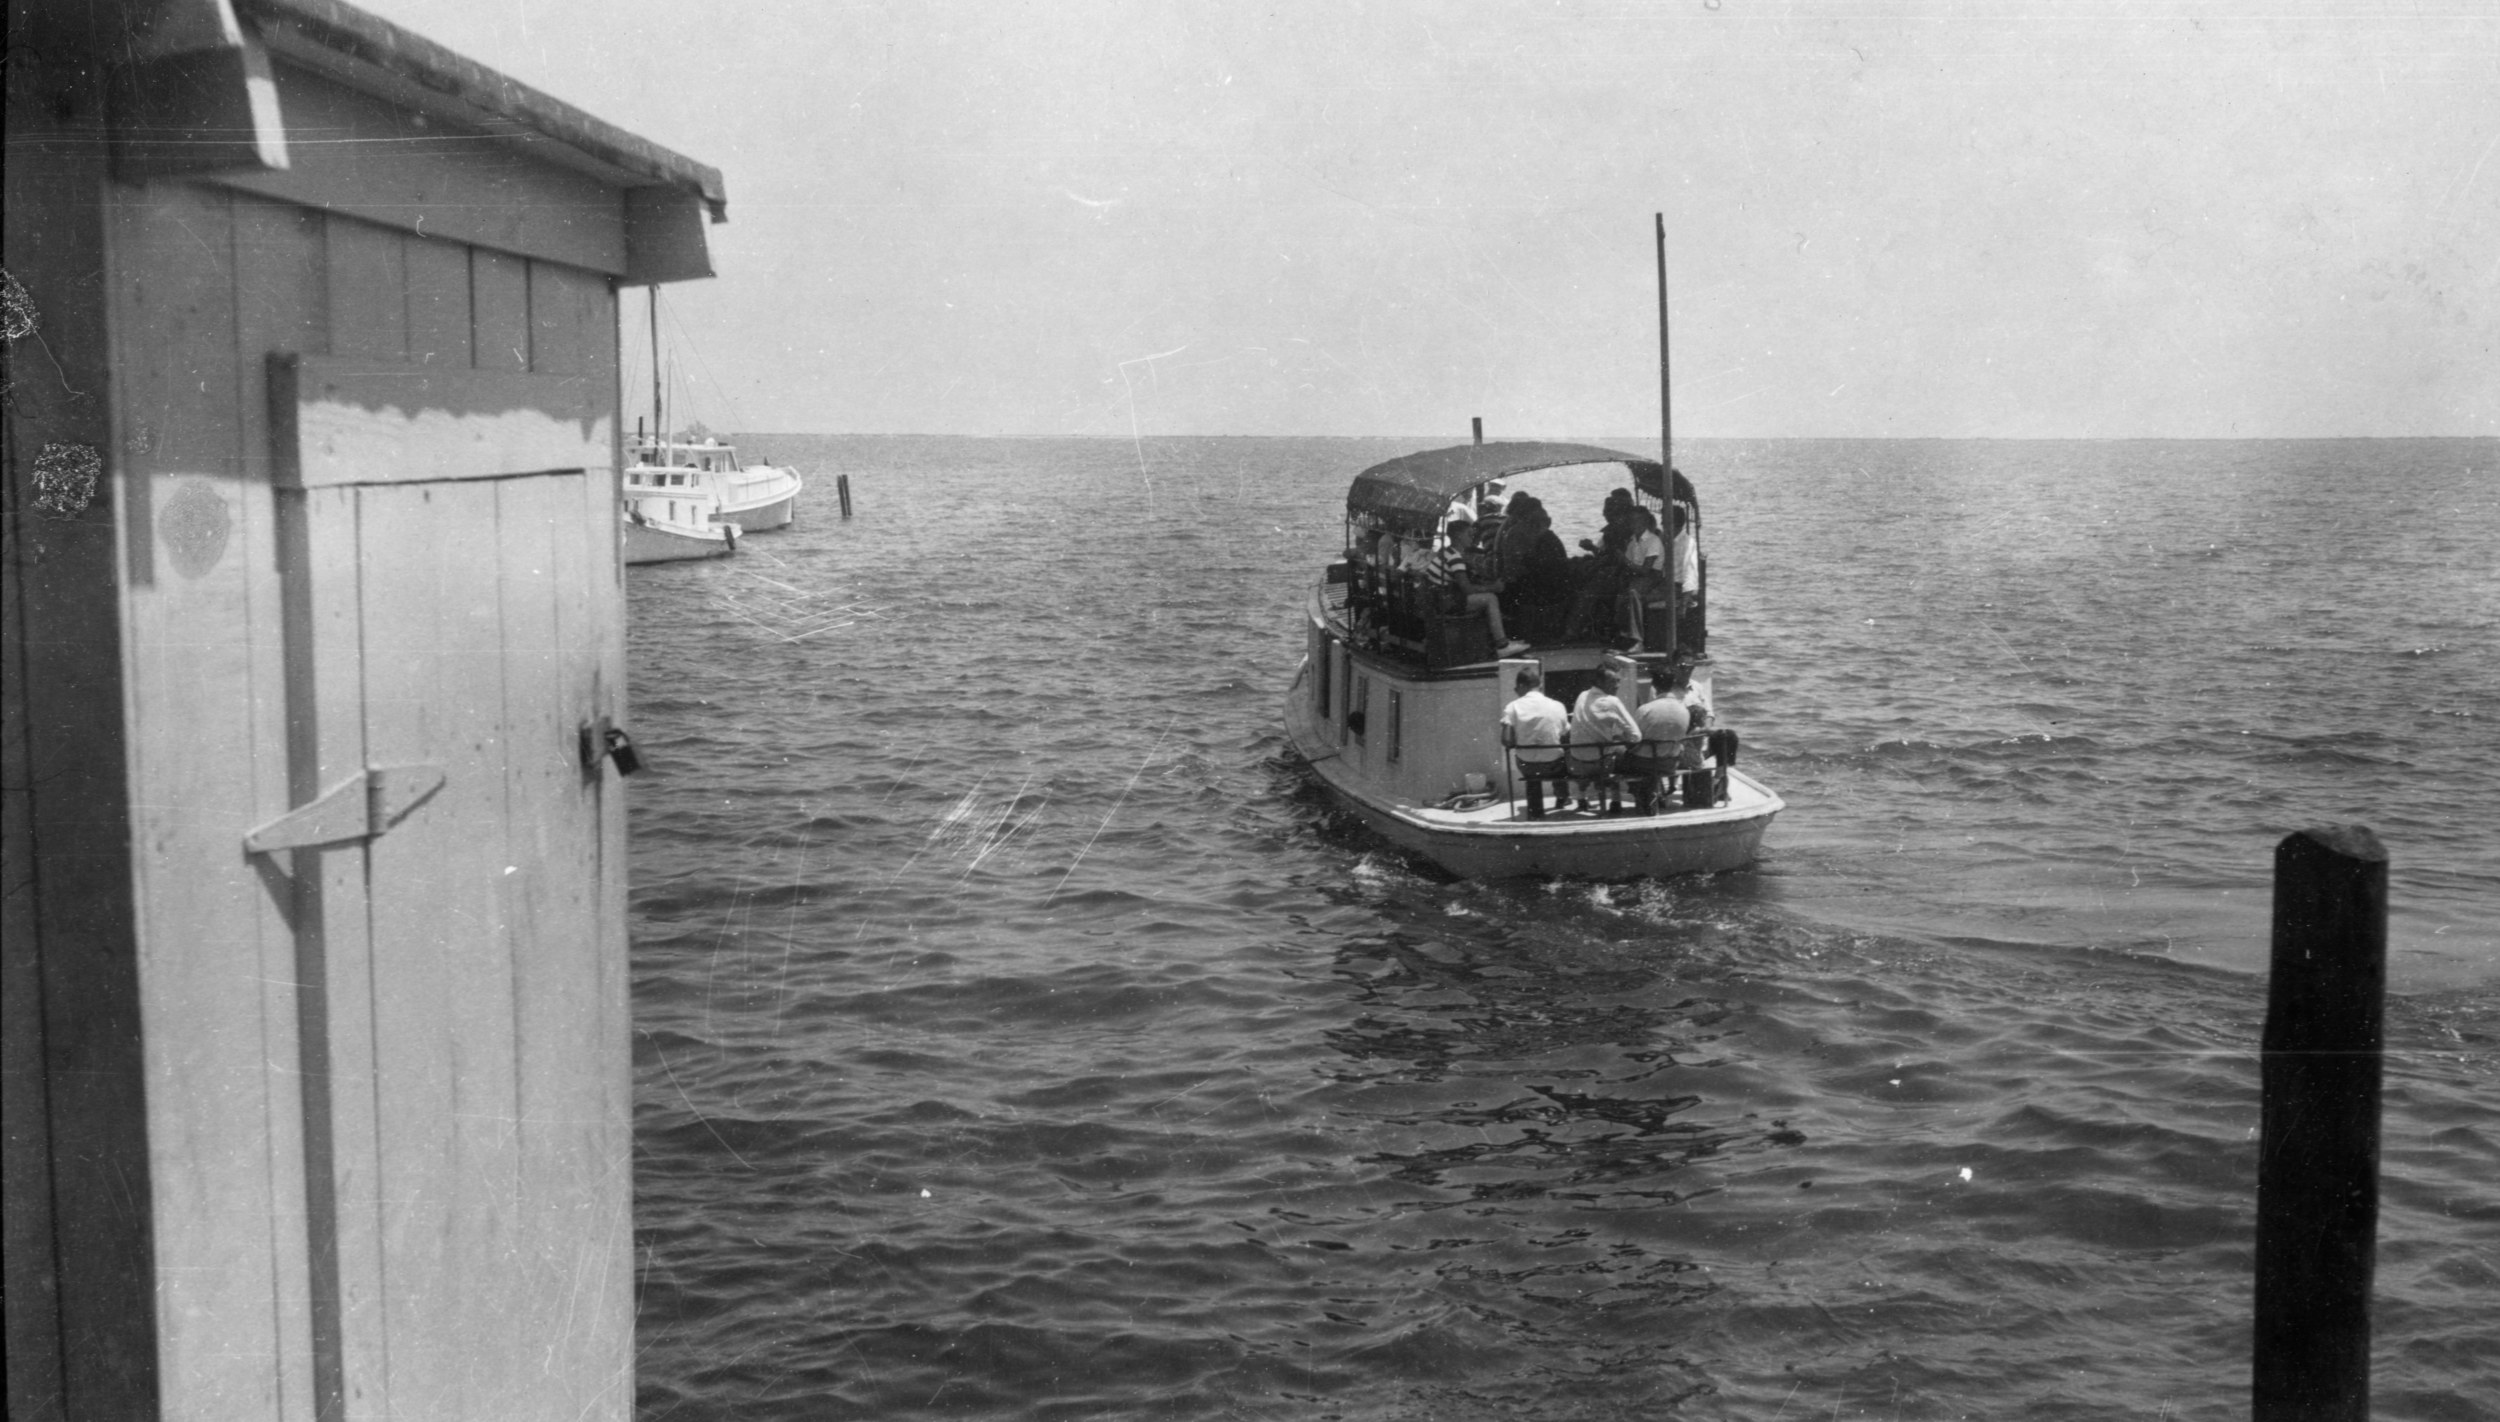 Mailboat Aleta Leaving Atlantic, 1920s